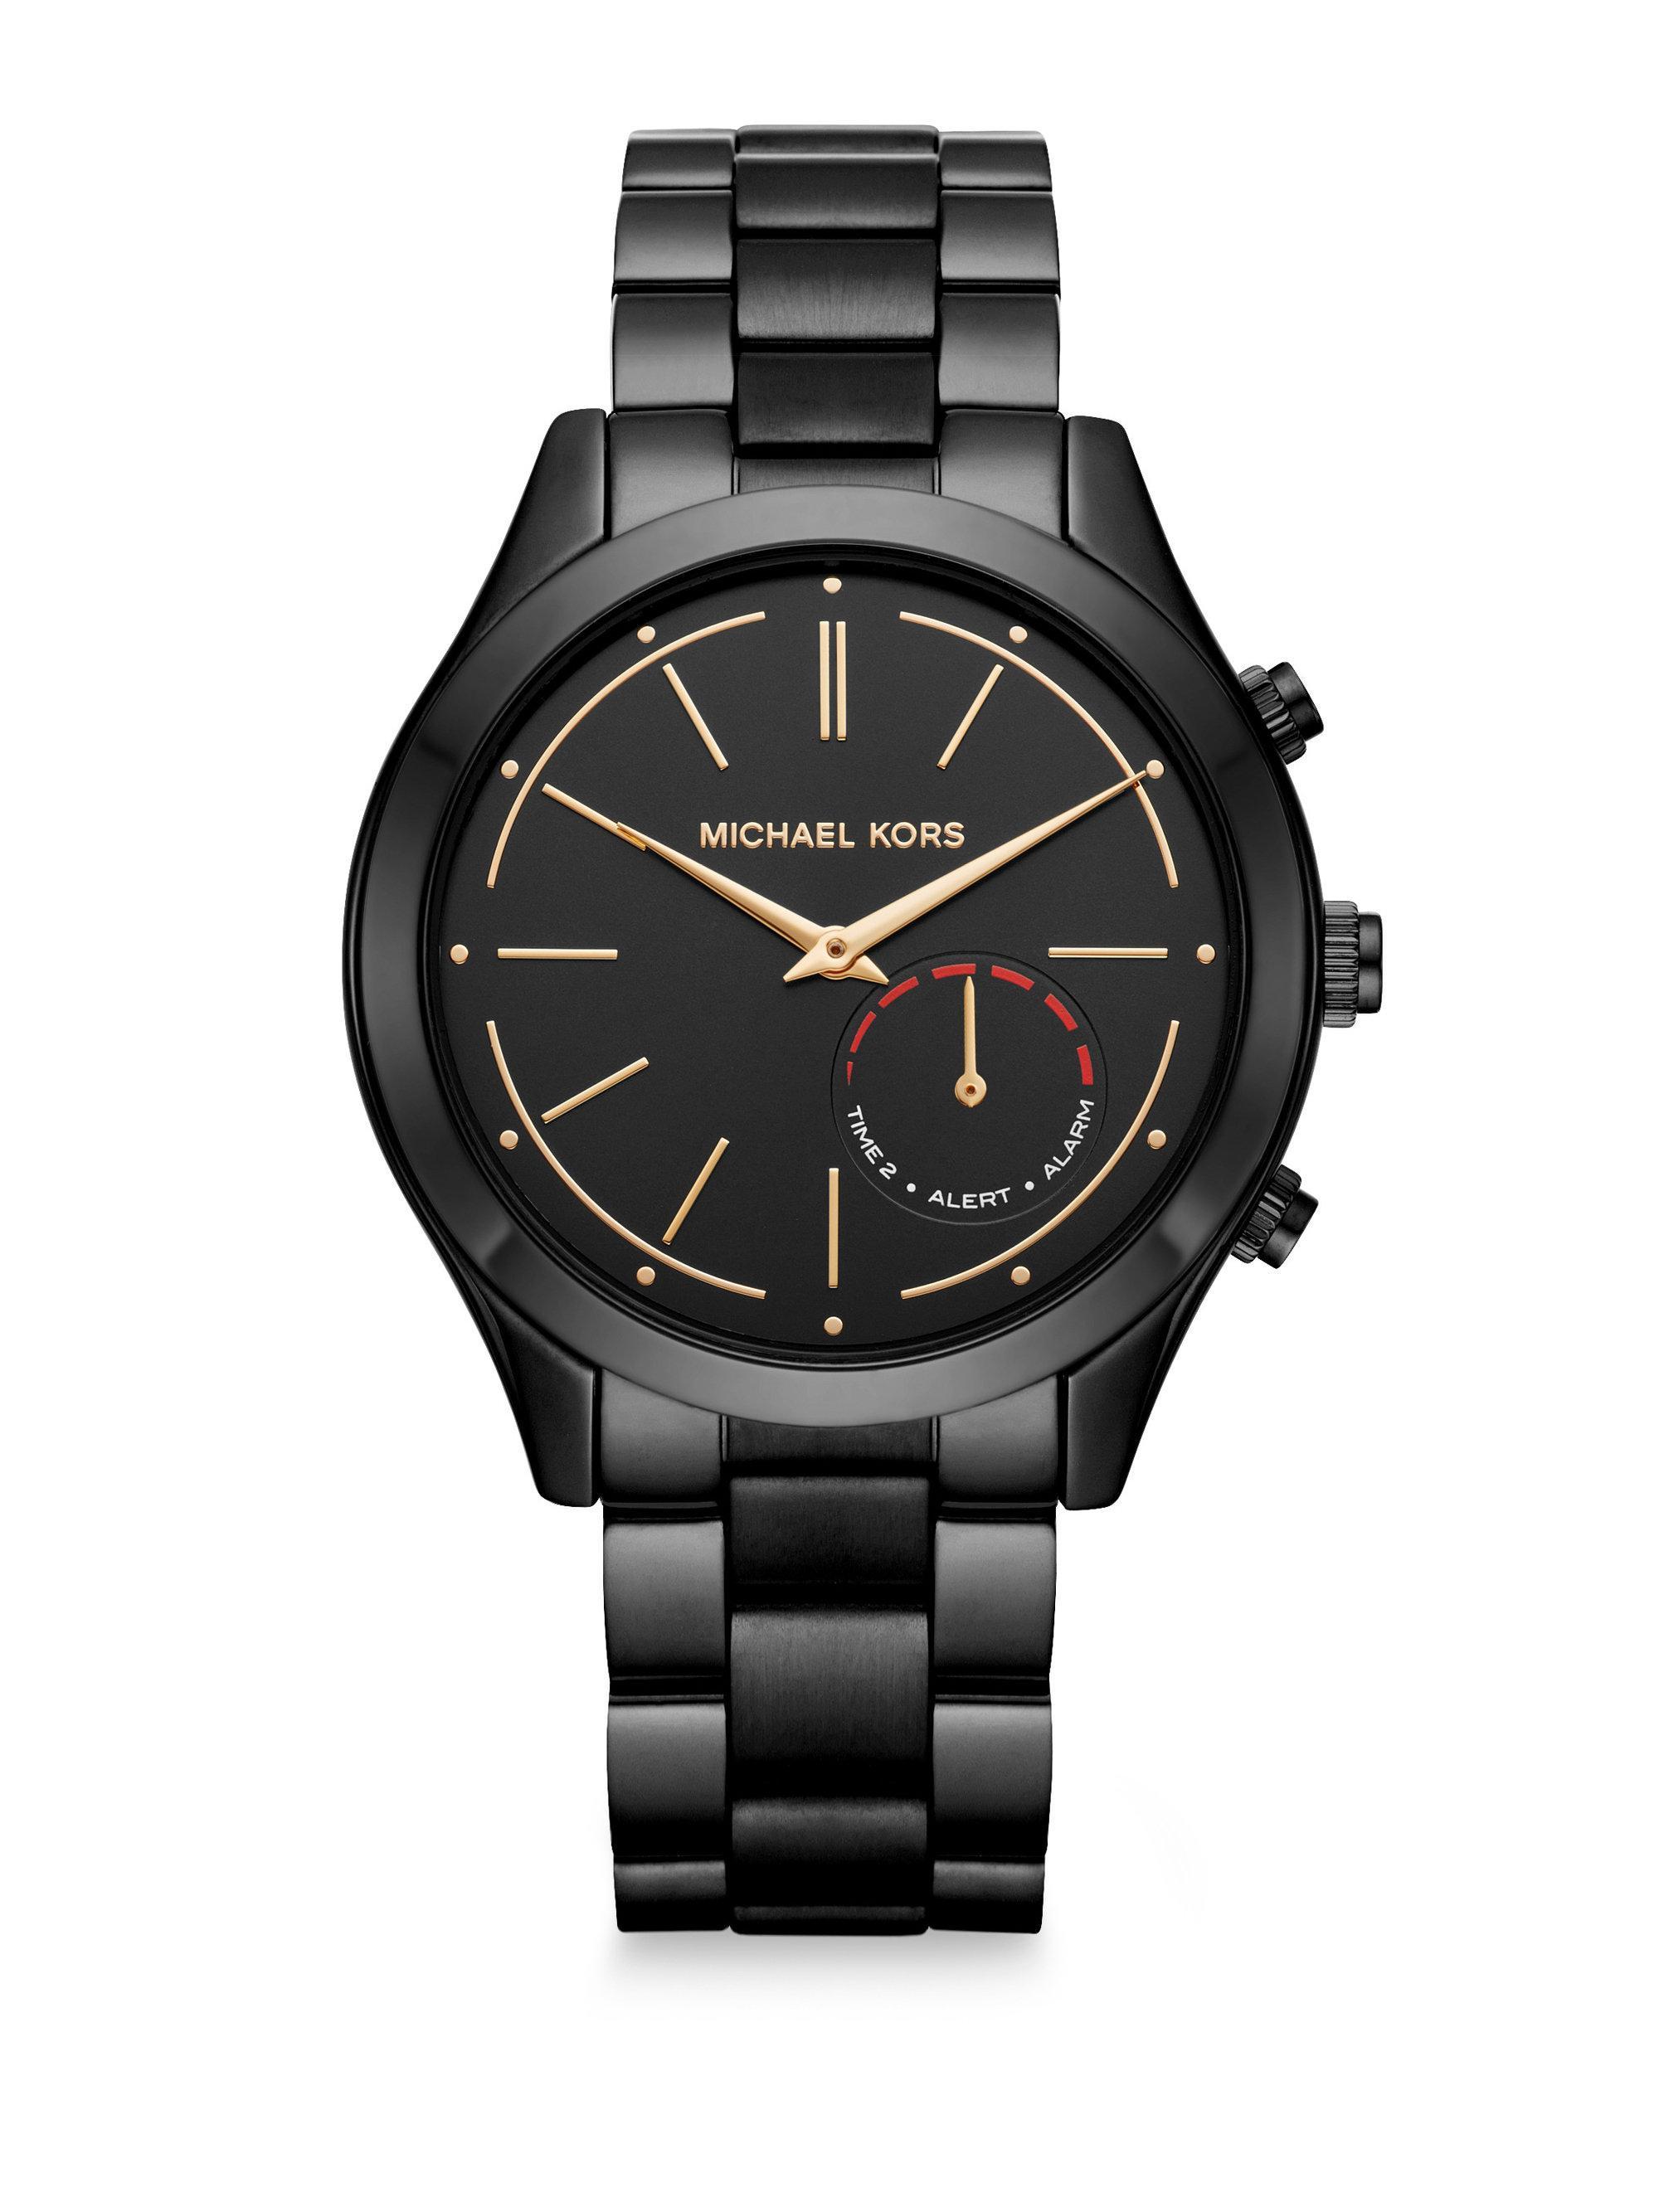 lyst michael kors access slim runway black ip stainless steel hybrid smartwatch in black for men. Black Bedroom Furniture Sets. Home Design Ideas